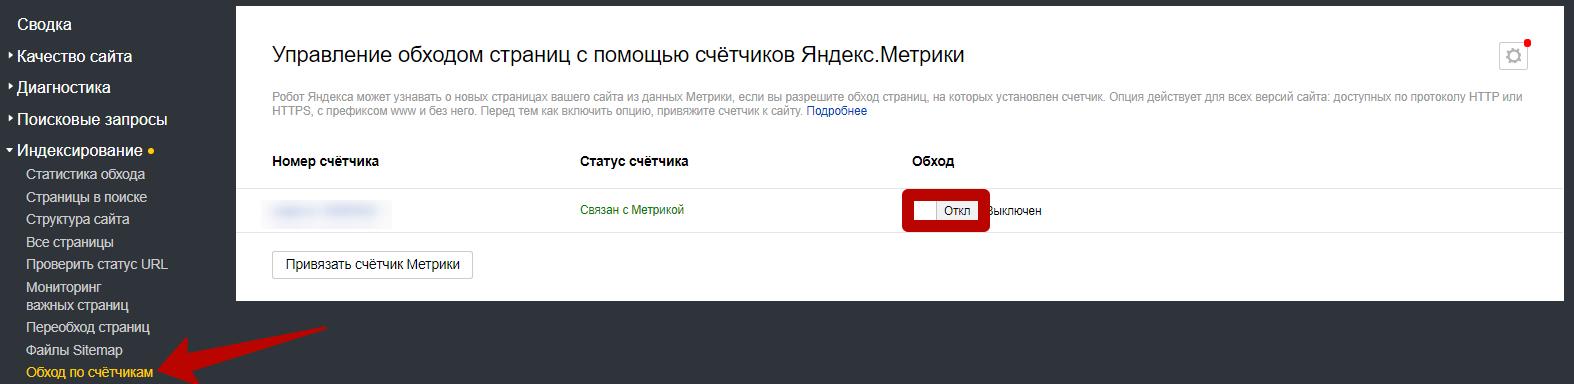 Яндекс Вебмастер – обход с помощью счетчика Метрики